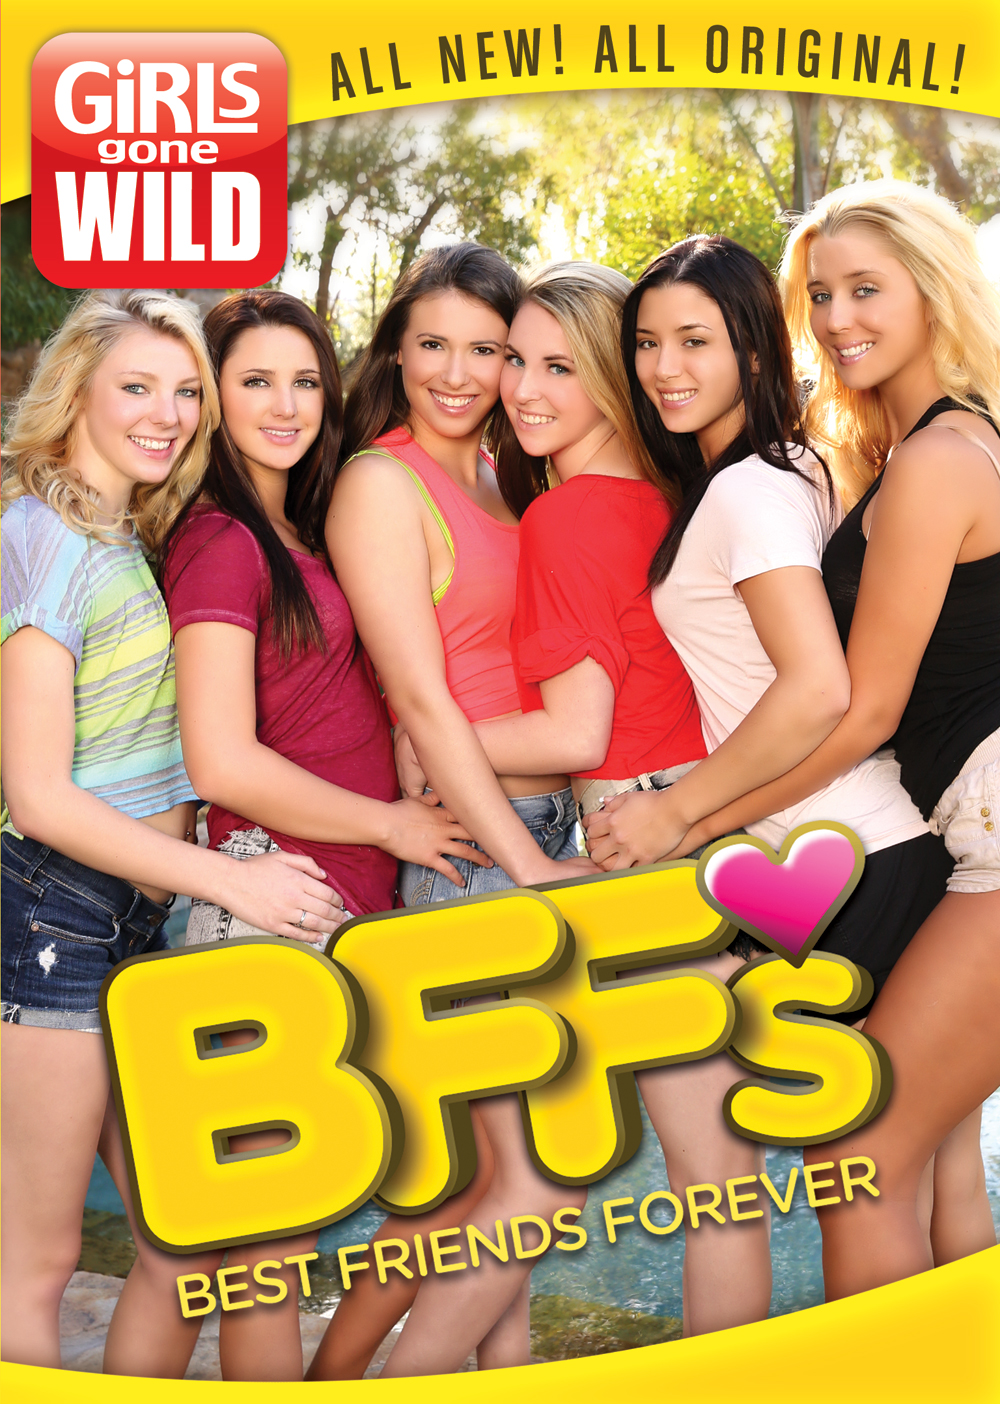 girls gone wild best friends forever data corrections